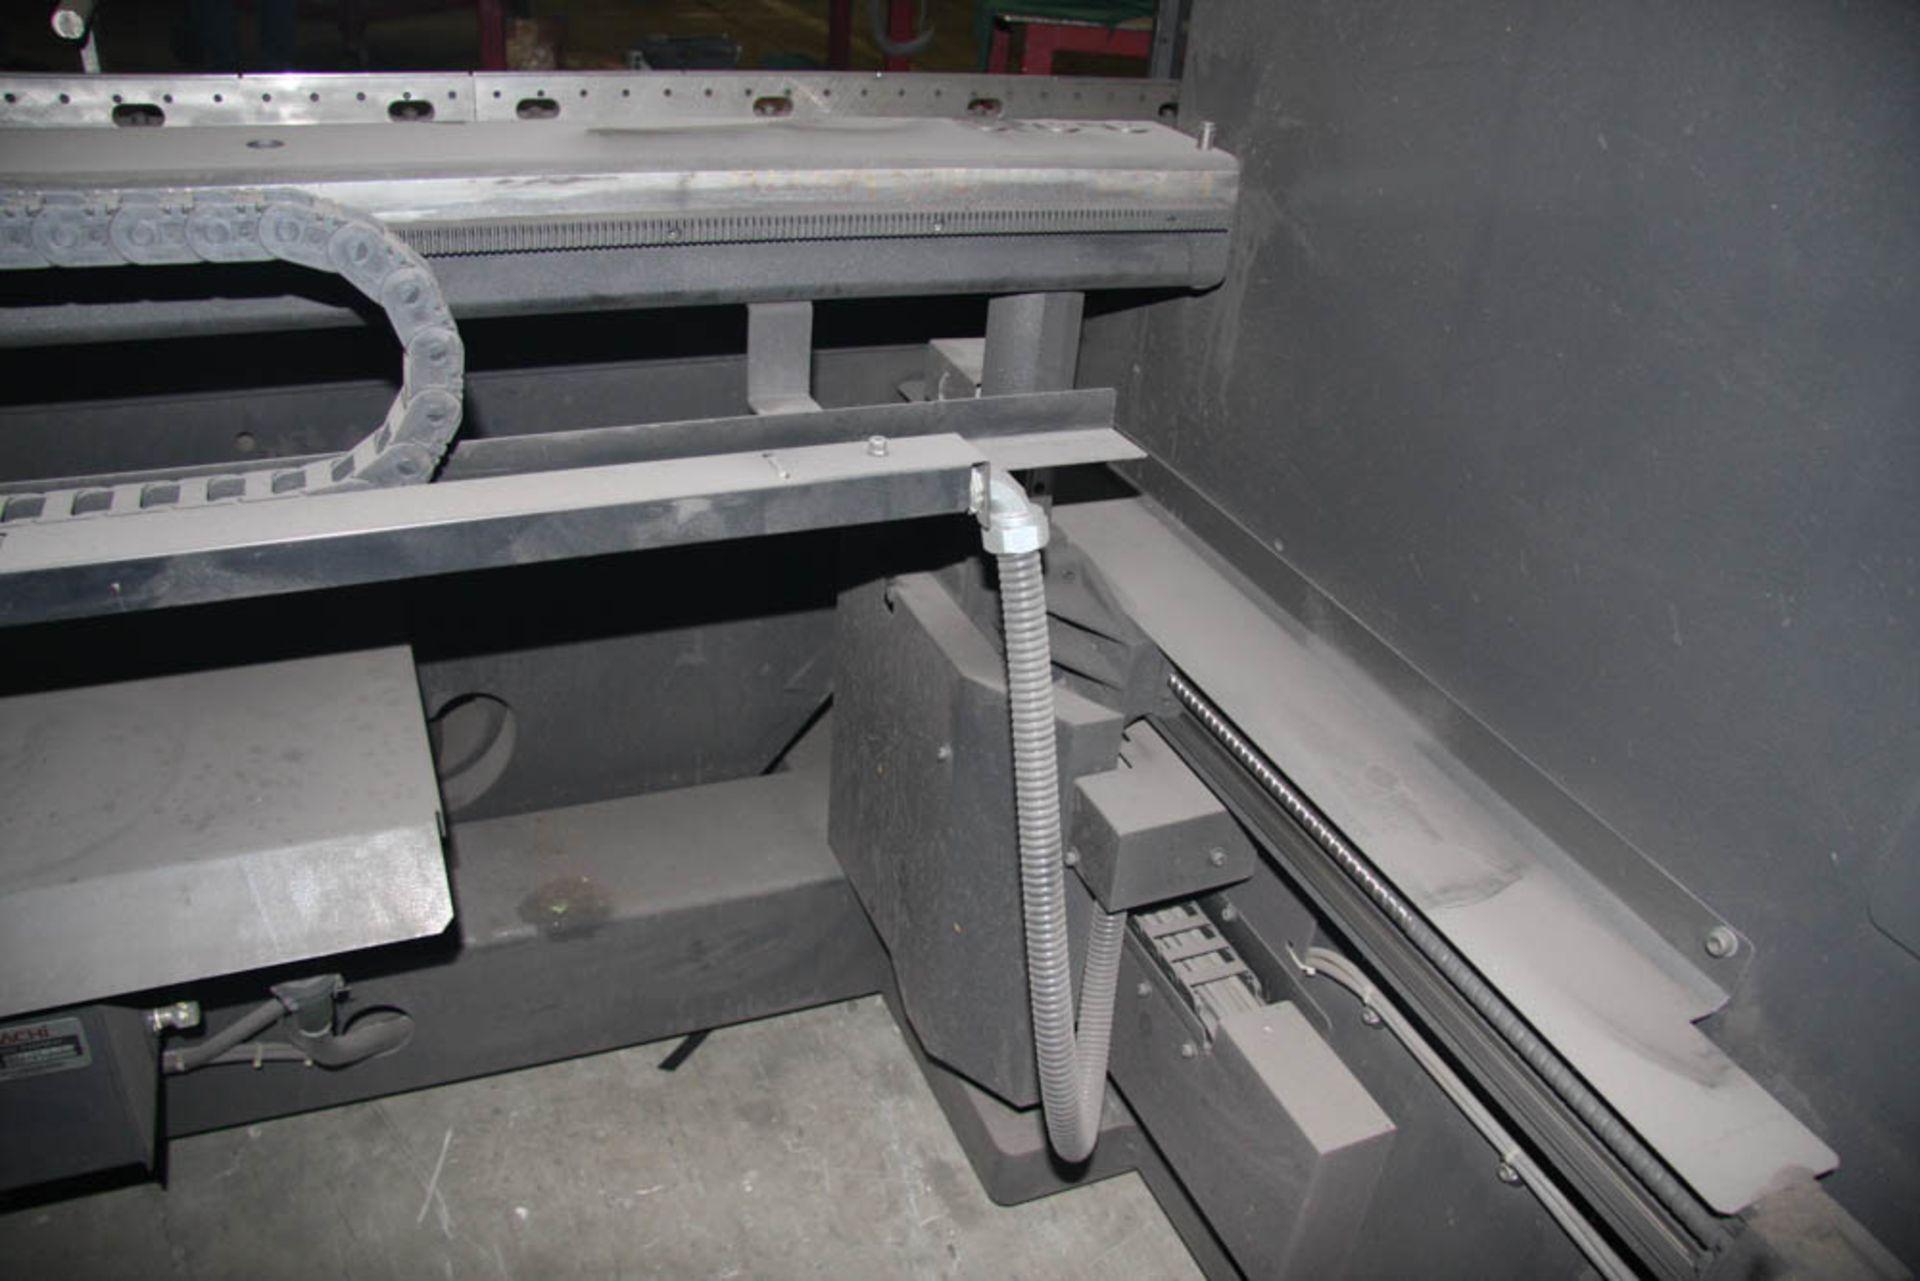 "2015 187 US TON X 122"" AMADA MDL. HG1703 CNC PRESS BRAKE, AMNC 3i CONTROL, 122"" MAX BEND LENGTH - Image 10 of 14"